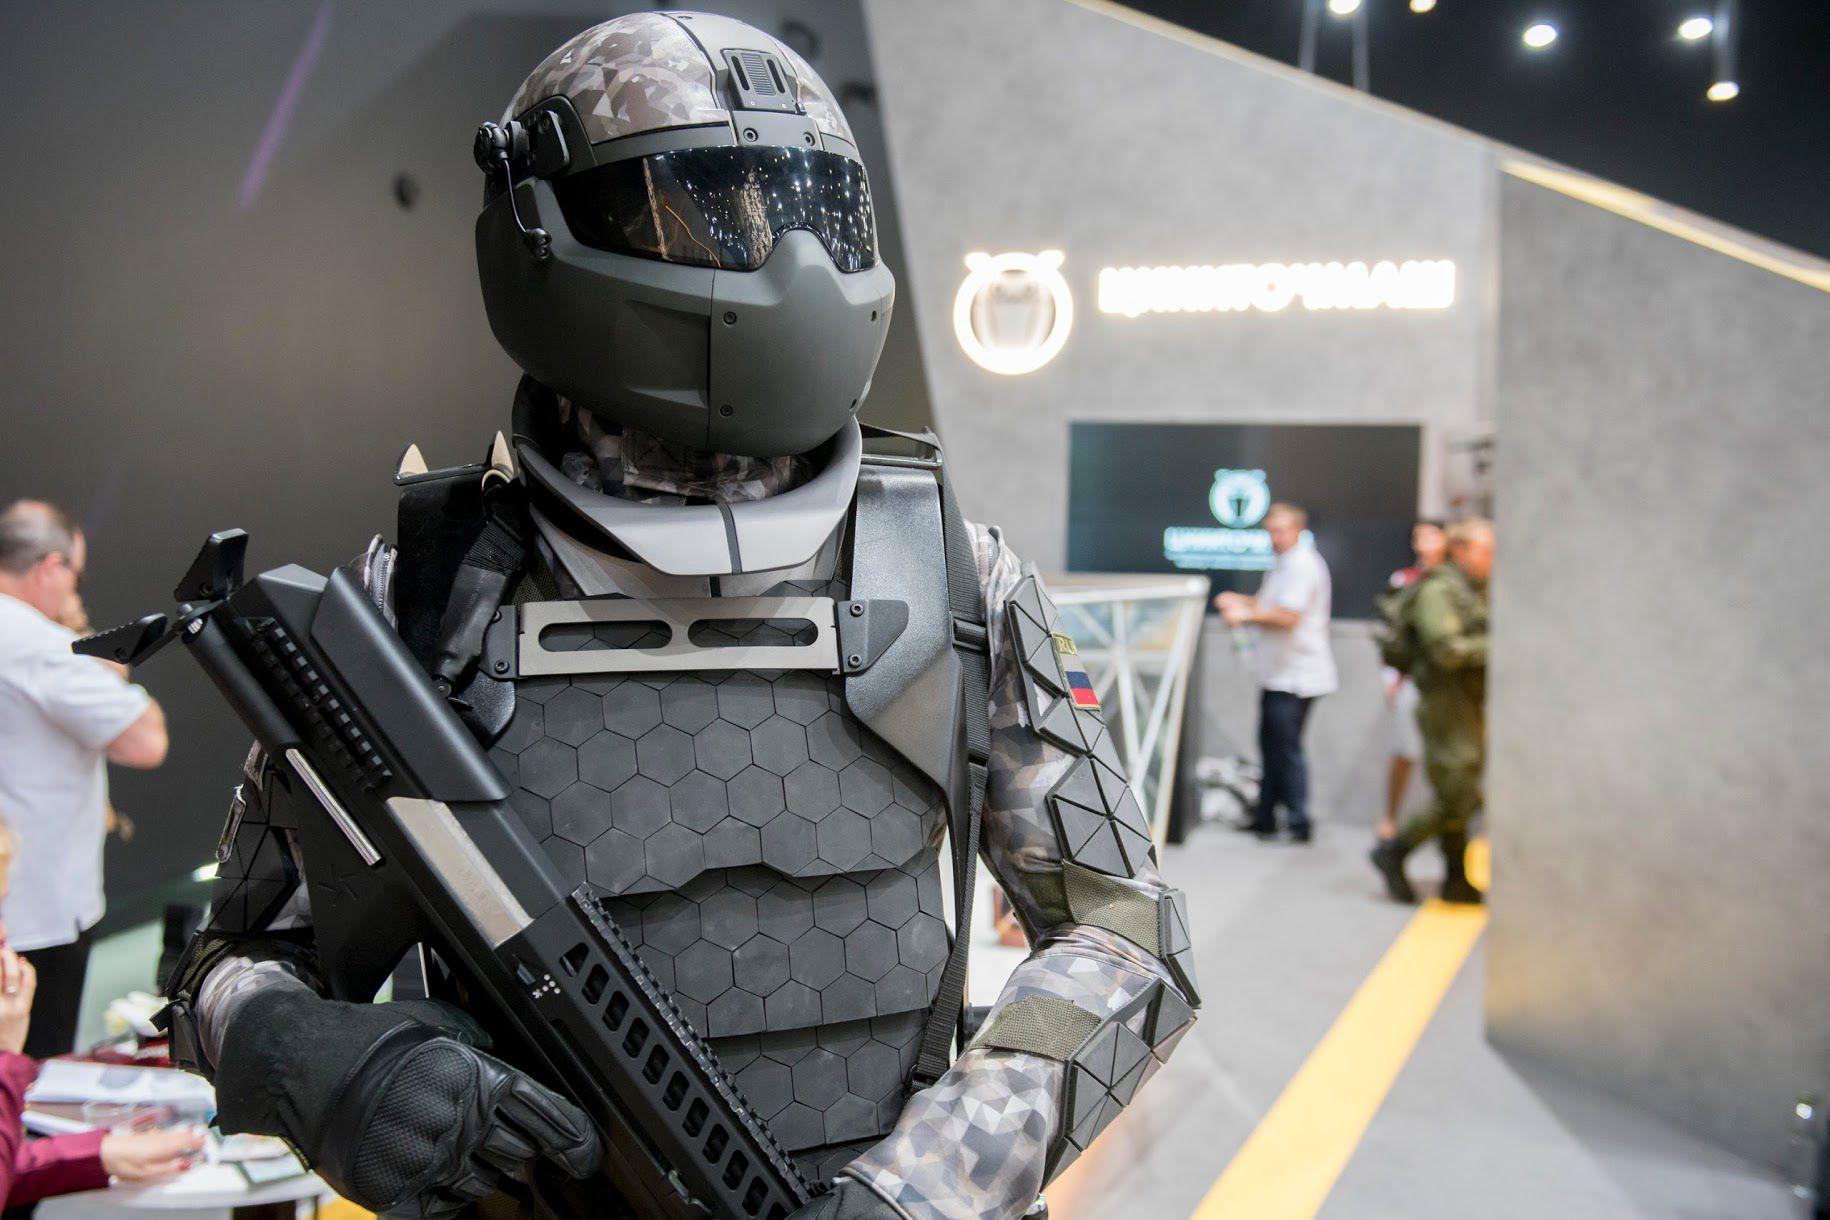 Militao Update: Rostec Russian Ratnik-3 Future Soldier Military 'Stealth